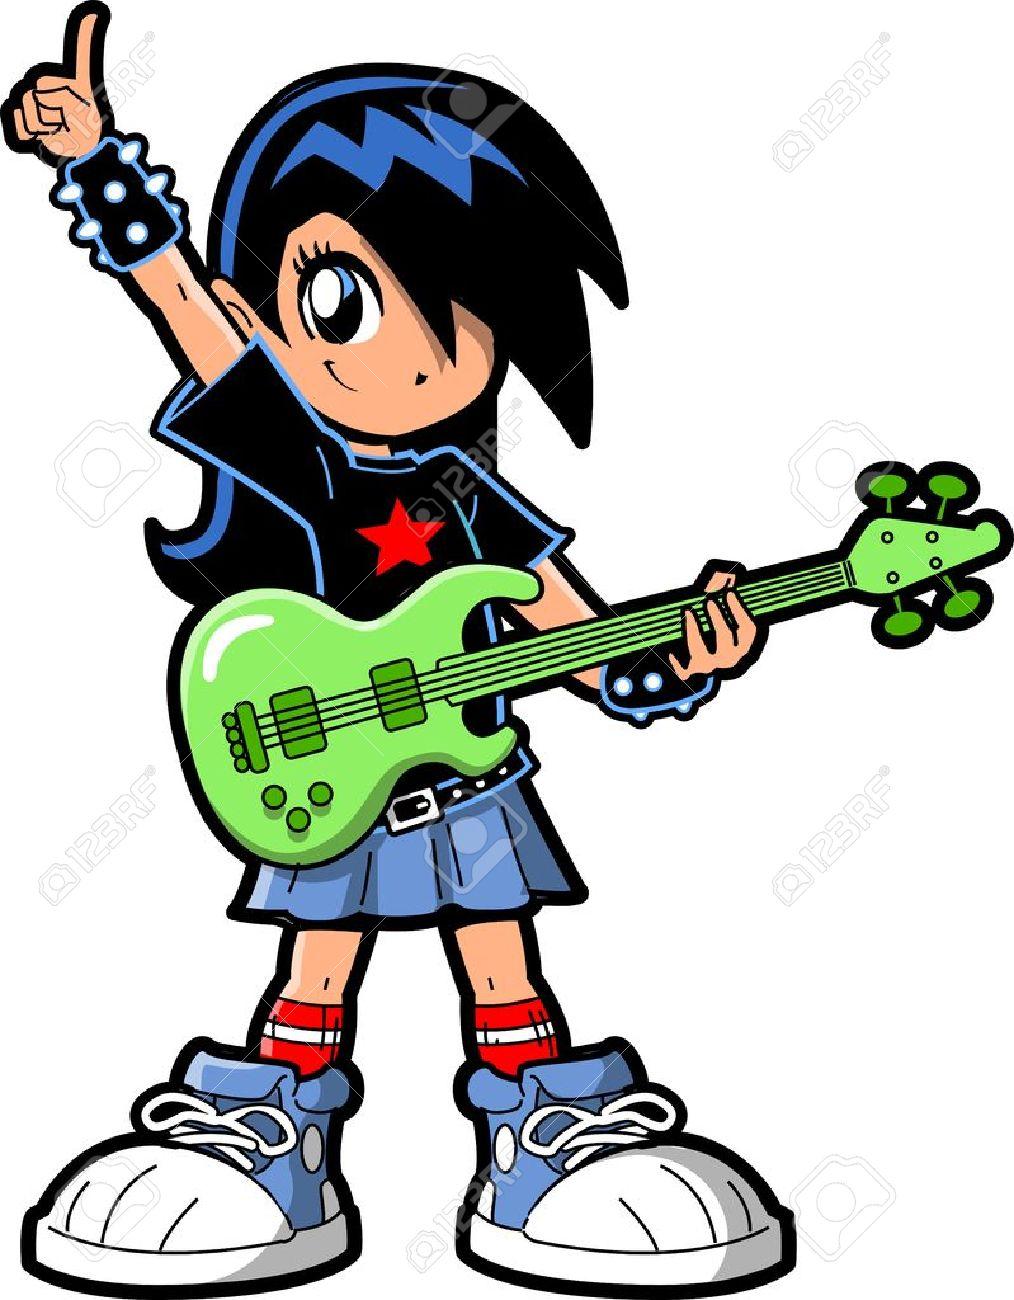 1014x1300 Anime Manga Girl Goth Emo Rock Star Guitar Bass Player Royalty